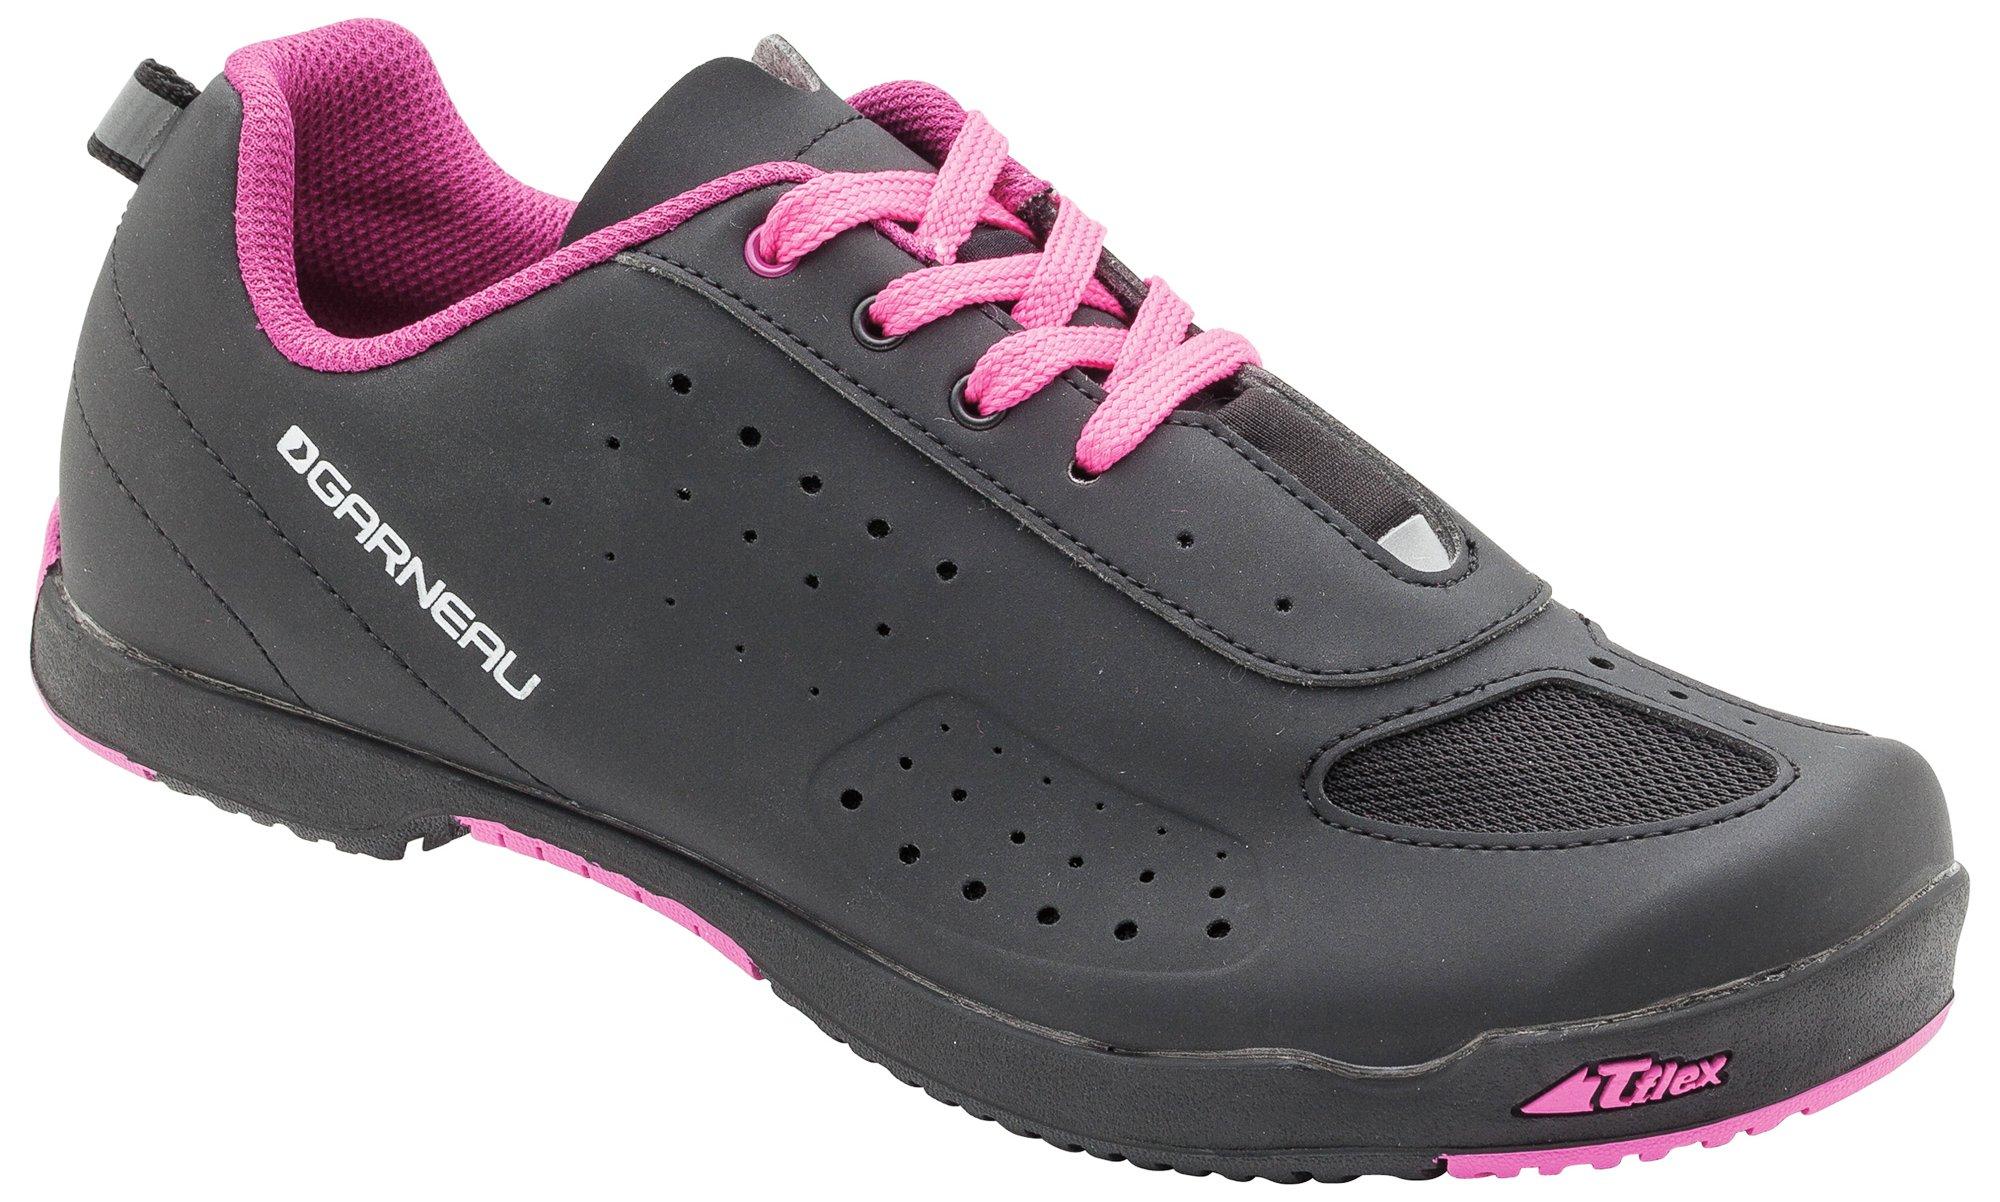 Louis Garneau Women's Urban Bike Shoes, Black/Pink, 41